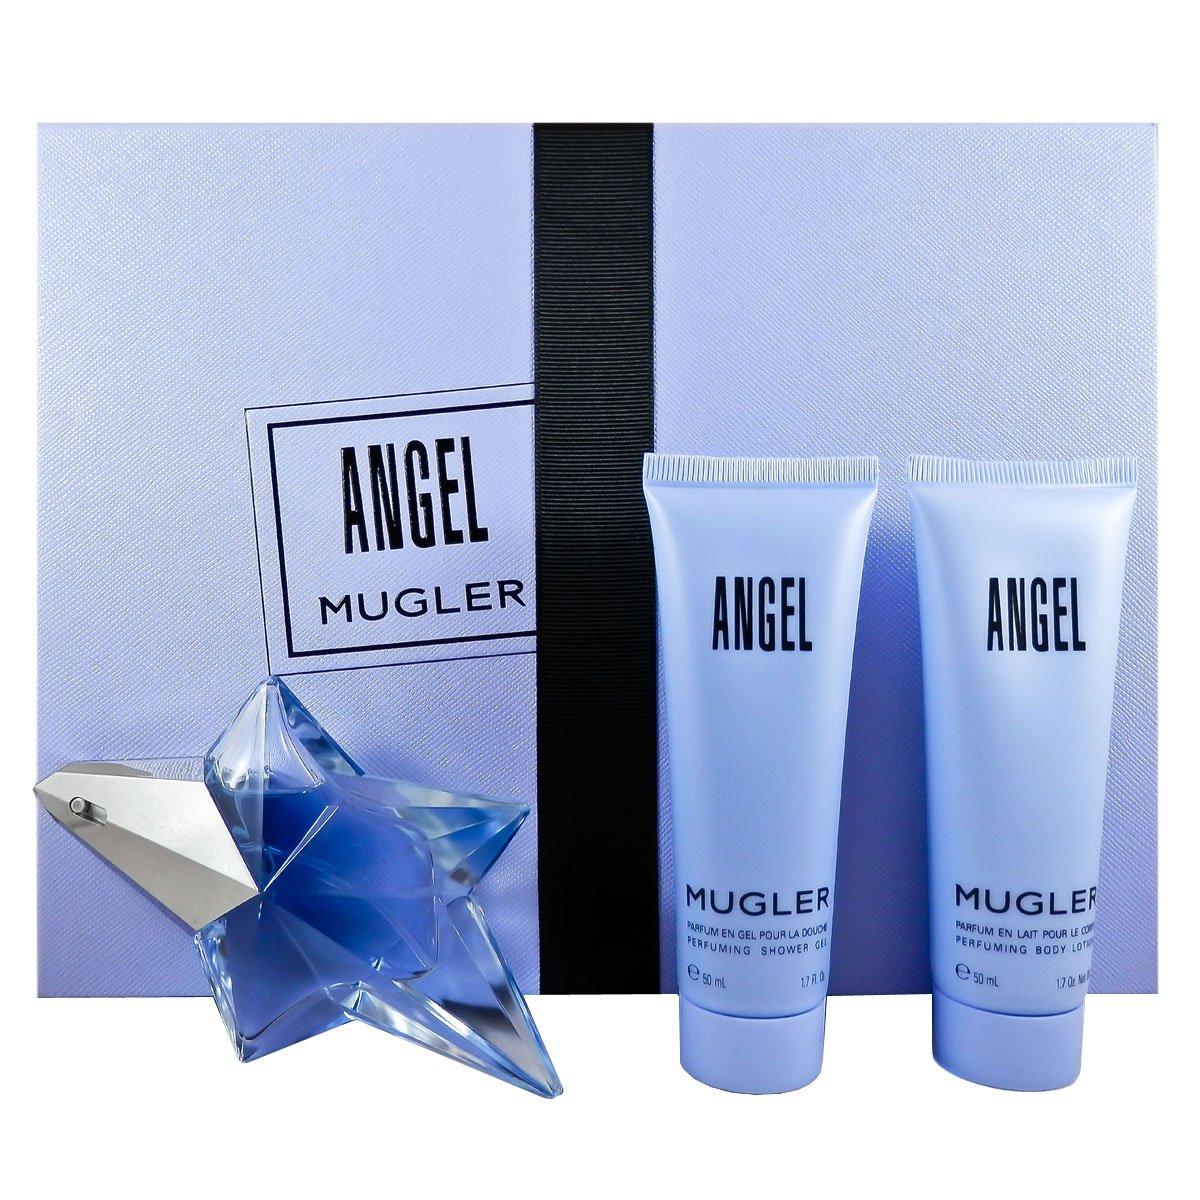 THIERRY MUGLER Angel EDP Refil Plus Body Lotion Plus Shower Gel, 25 ml ZANG01